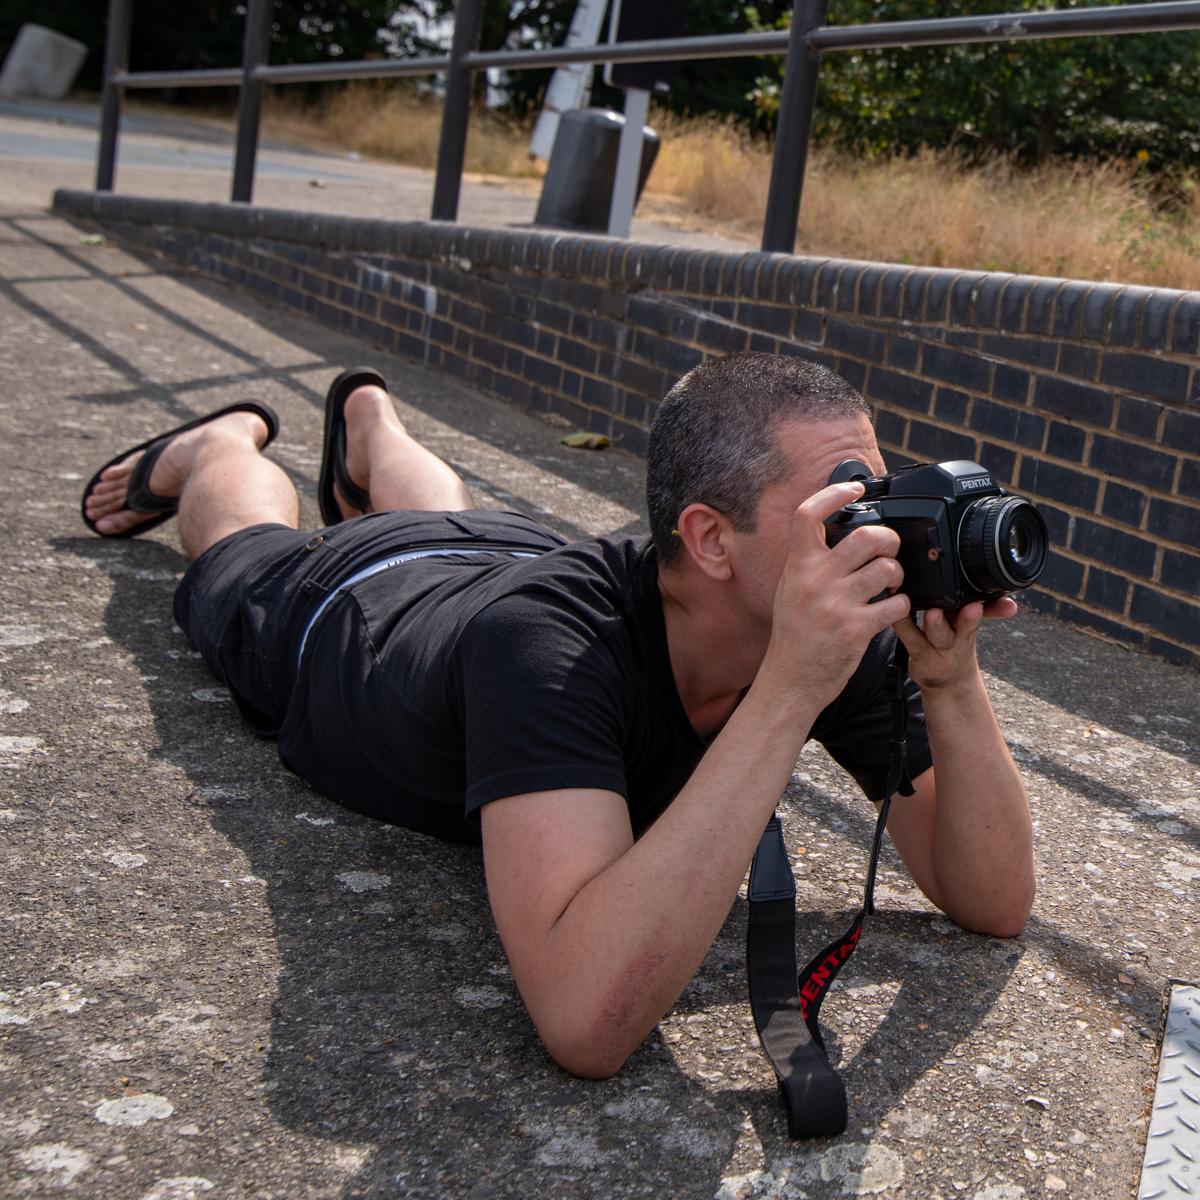 London-photographer-JC-Candanedo-Grey-Pistachio-Fashion-Corporate-Portraits-Headshots-Blog-Creative-Industry-Medium-Format-Film-2.jpg